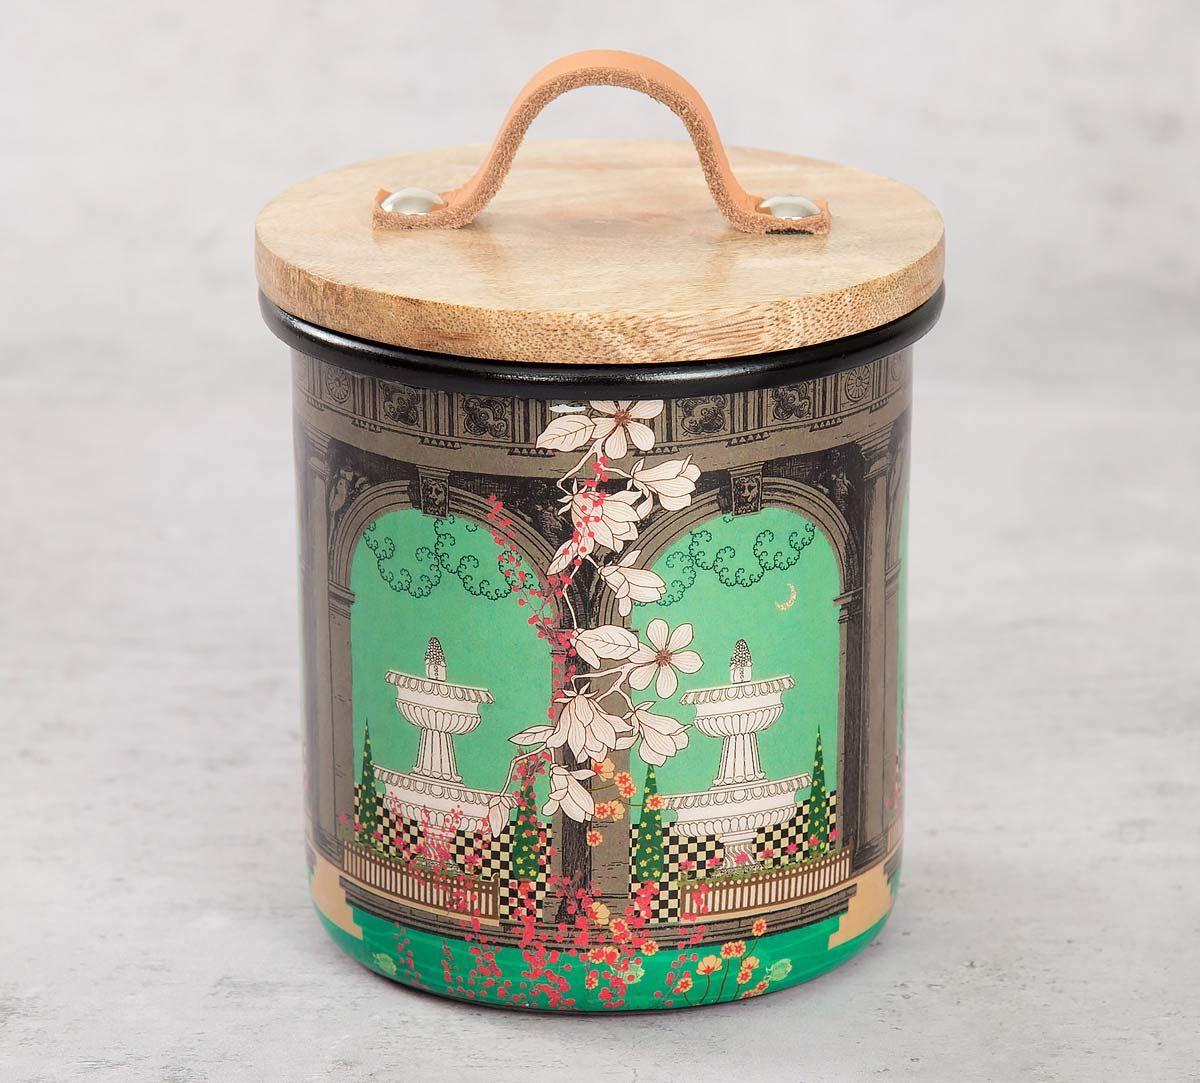 India Circus Mughal Raazmataz Cookie Jar